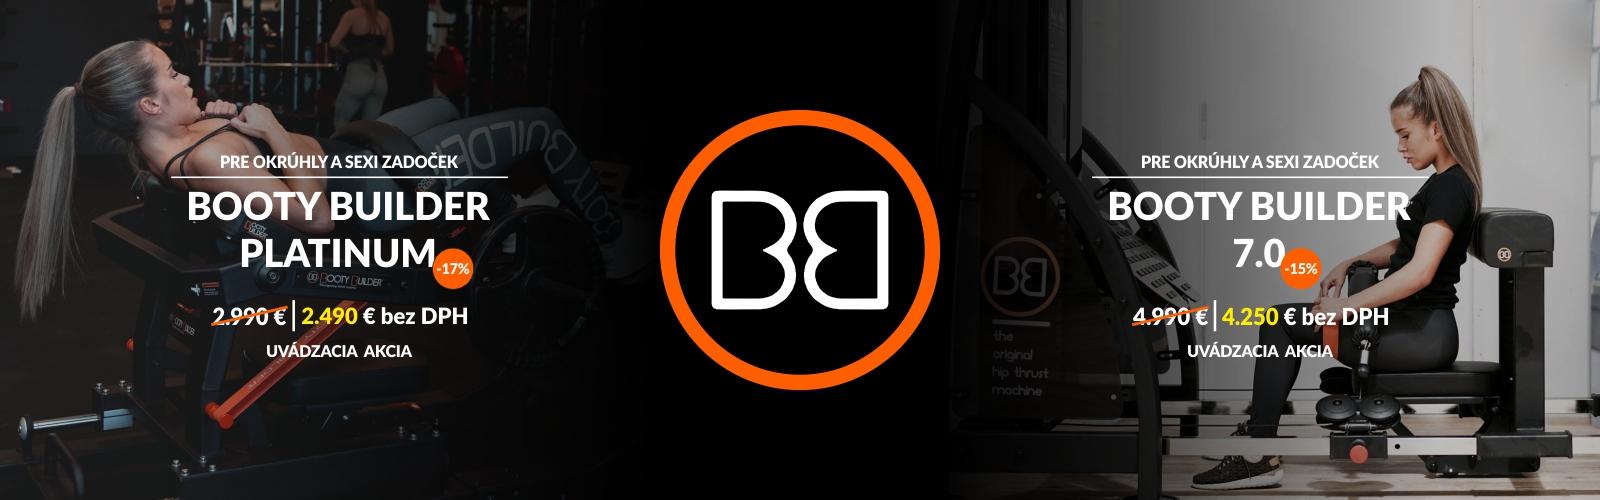 Booty Builder 7.0 Platinum Slovensko